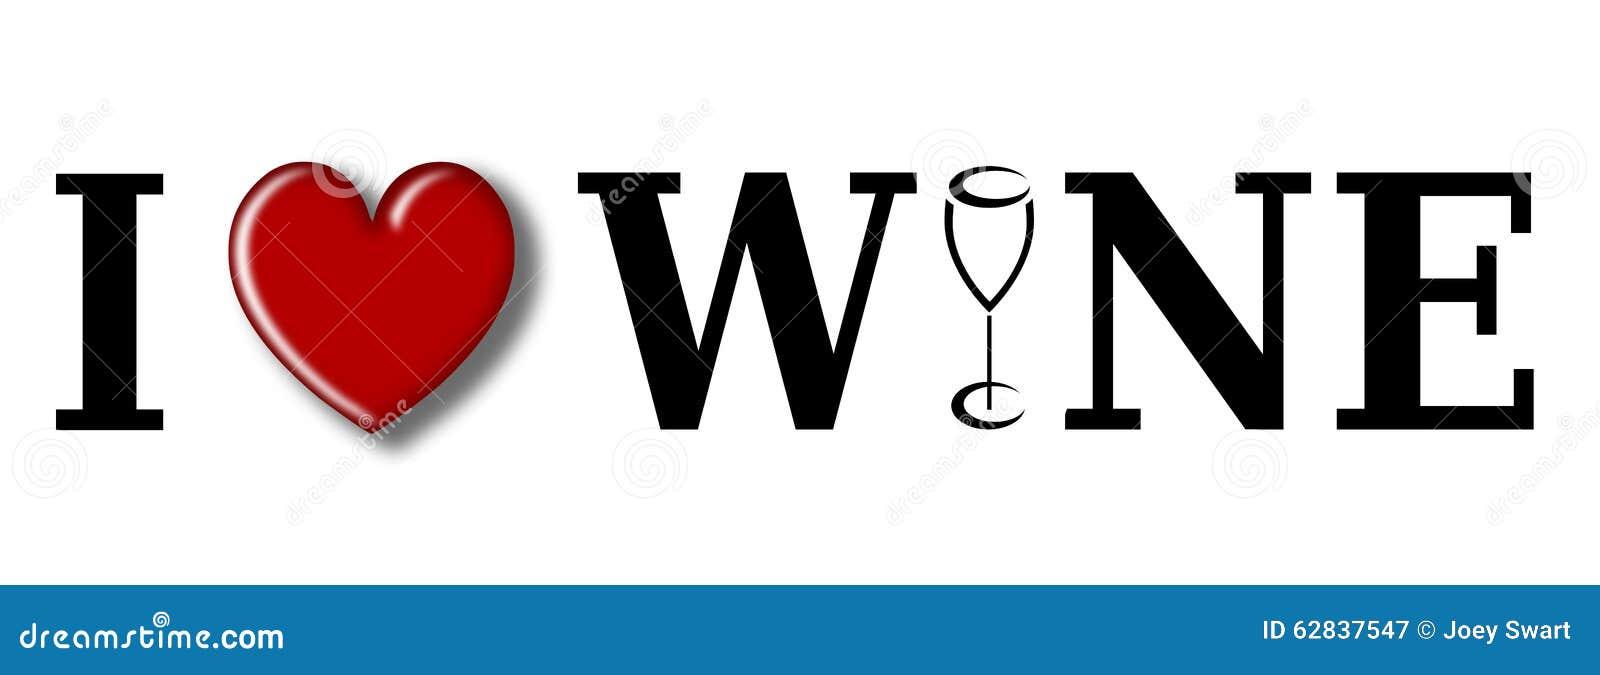 I Love Wine. Stock Illustration - Image: 62837547